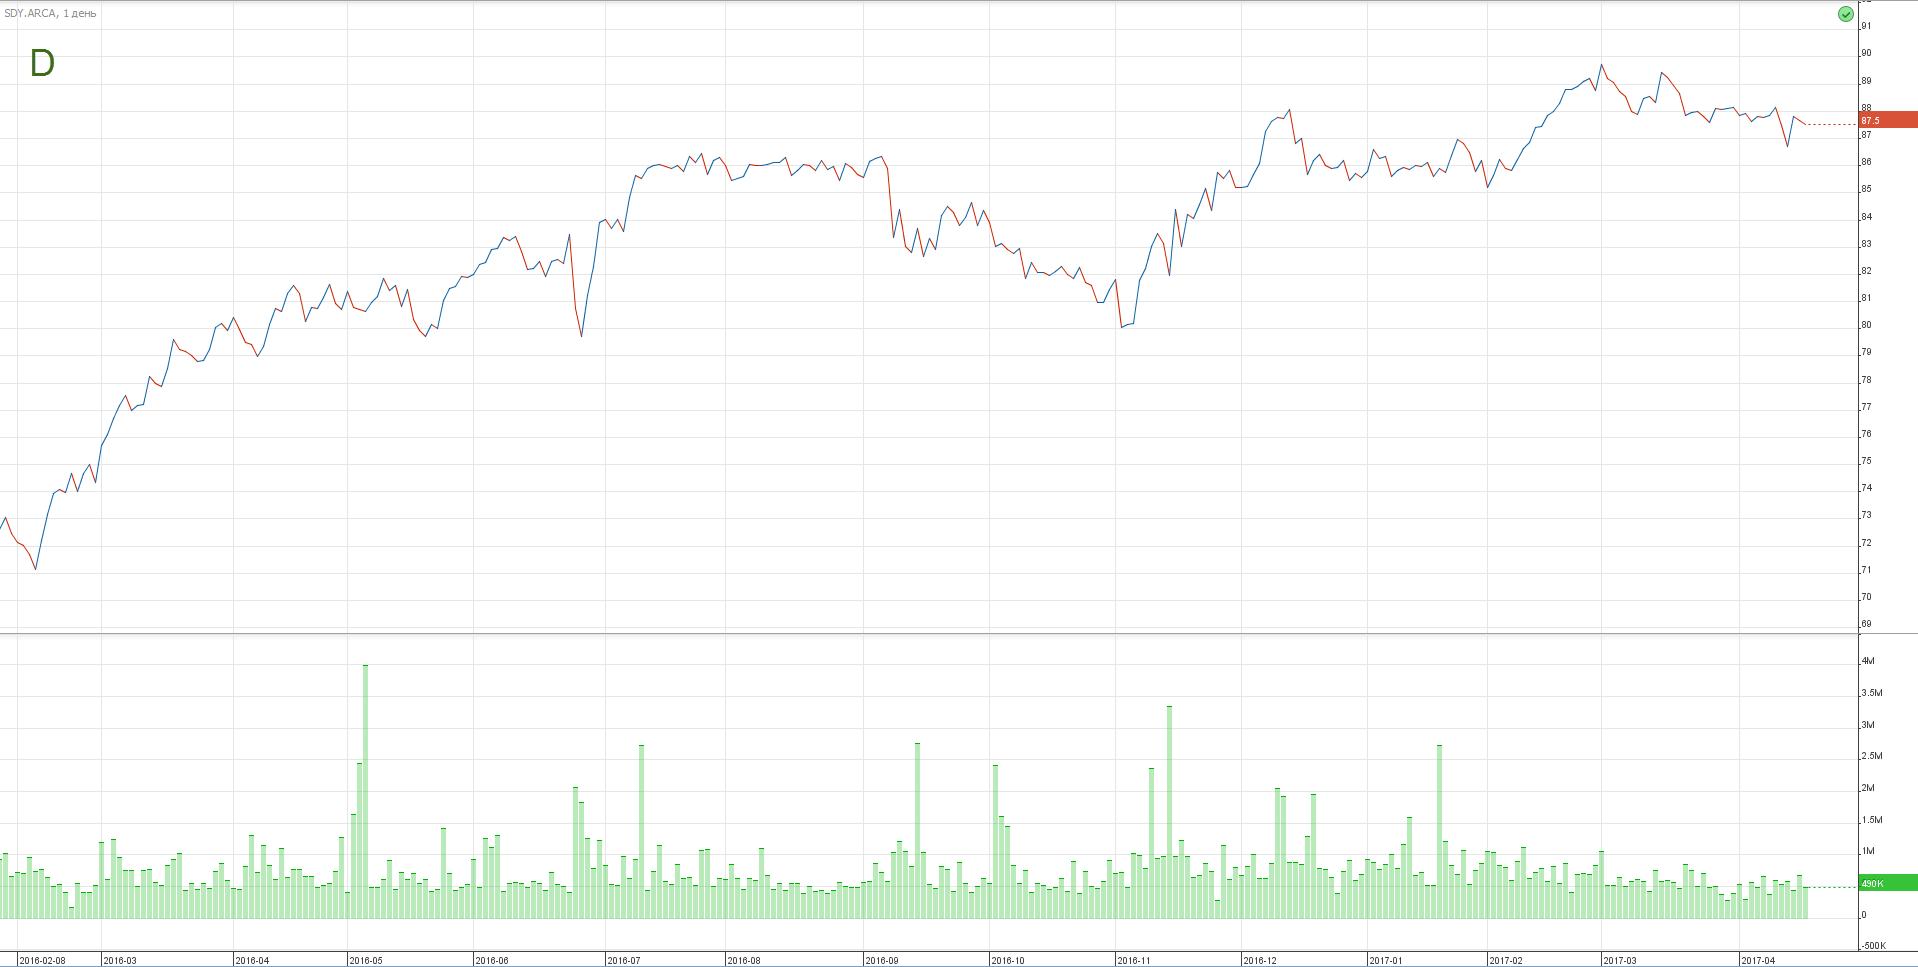 акции SPDR S&P Dividend ETF